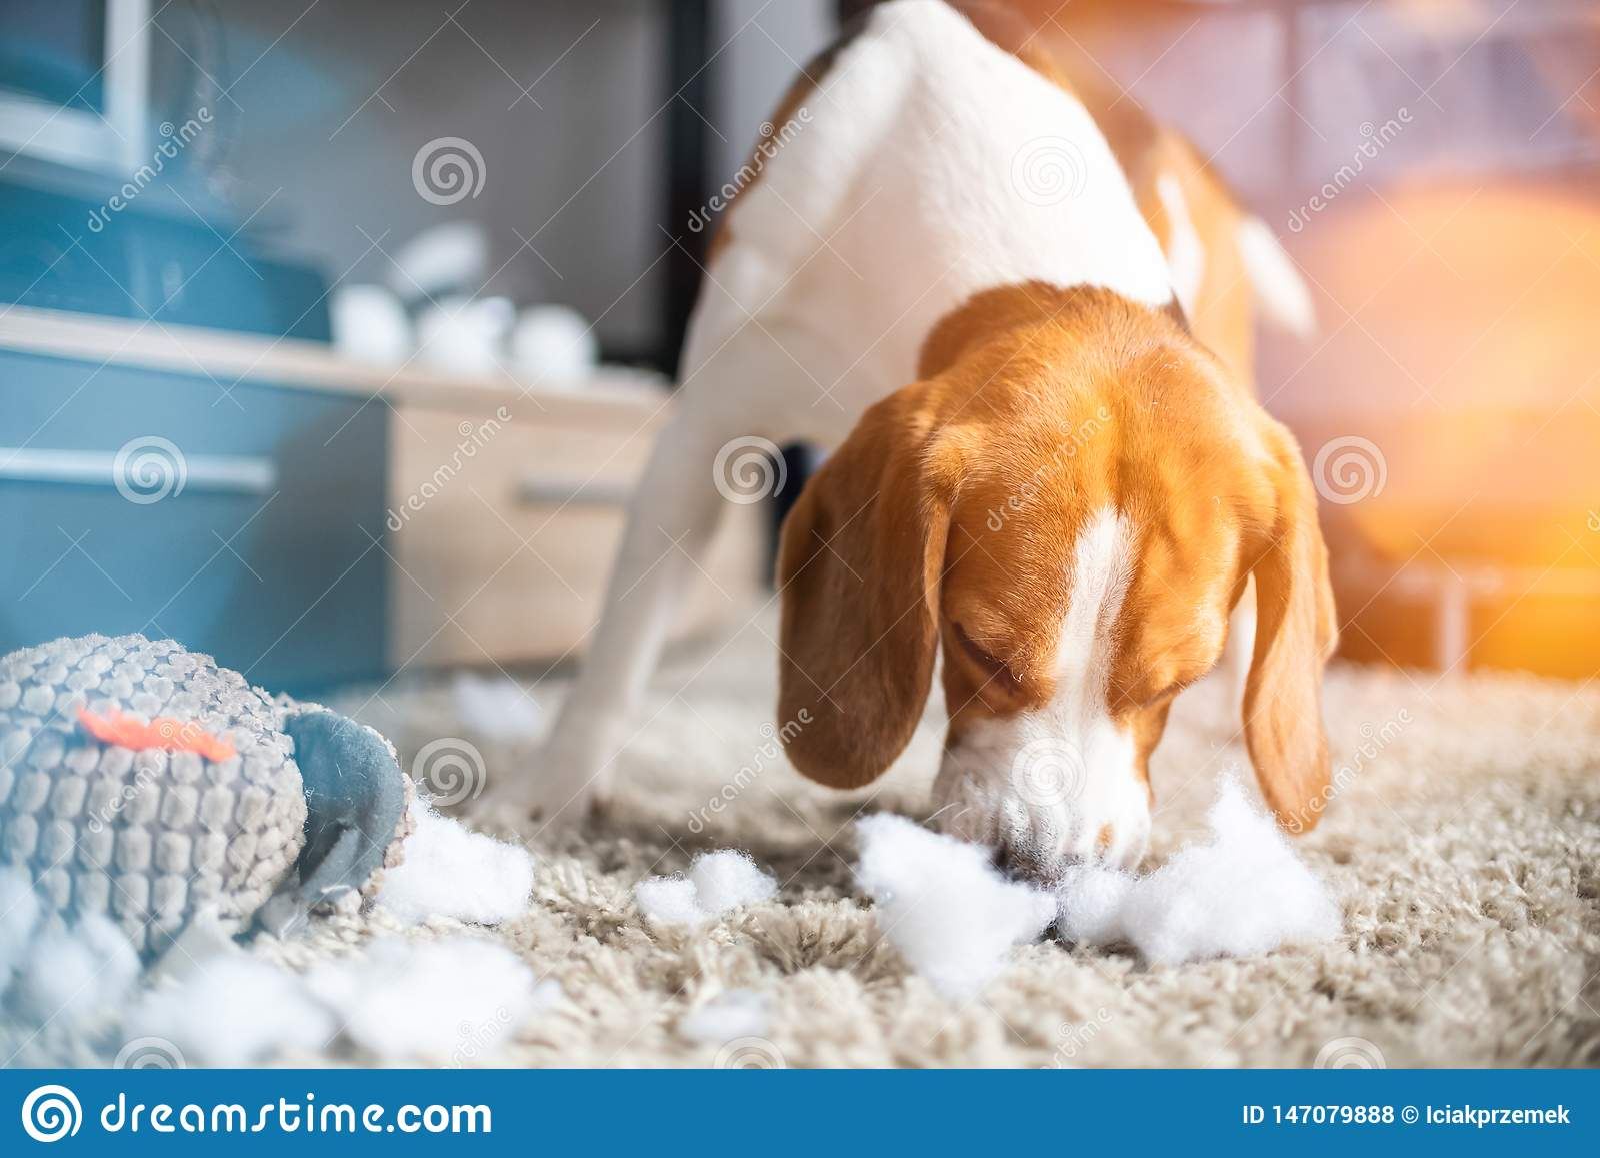 Сулой собаки бигля игрушка в части на ковре